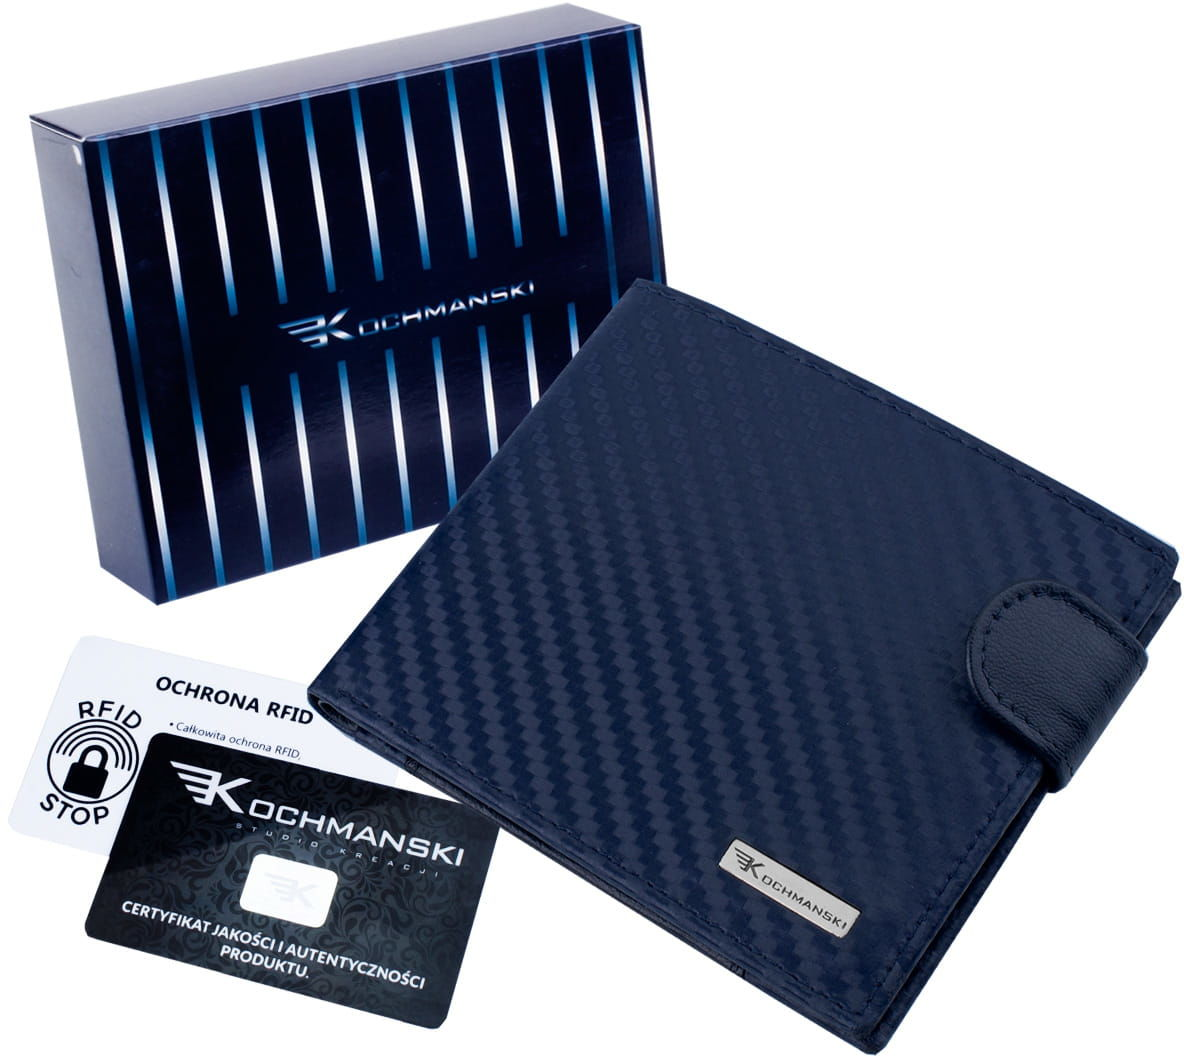 KOCHMANSKI cienki skórzany portfel męski PREMIUM 3212